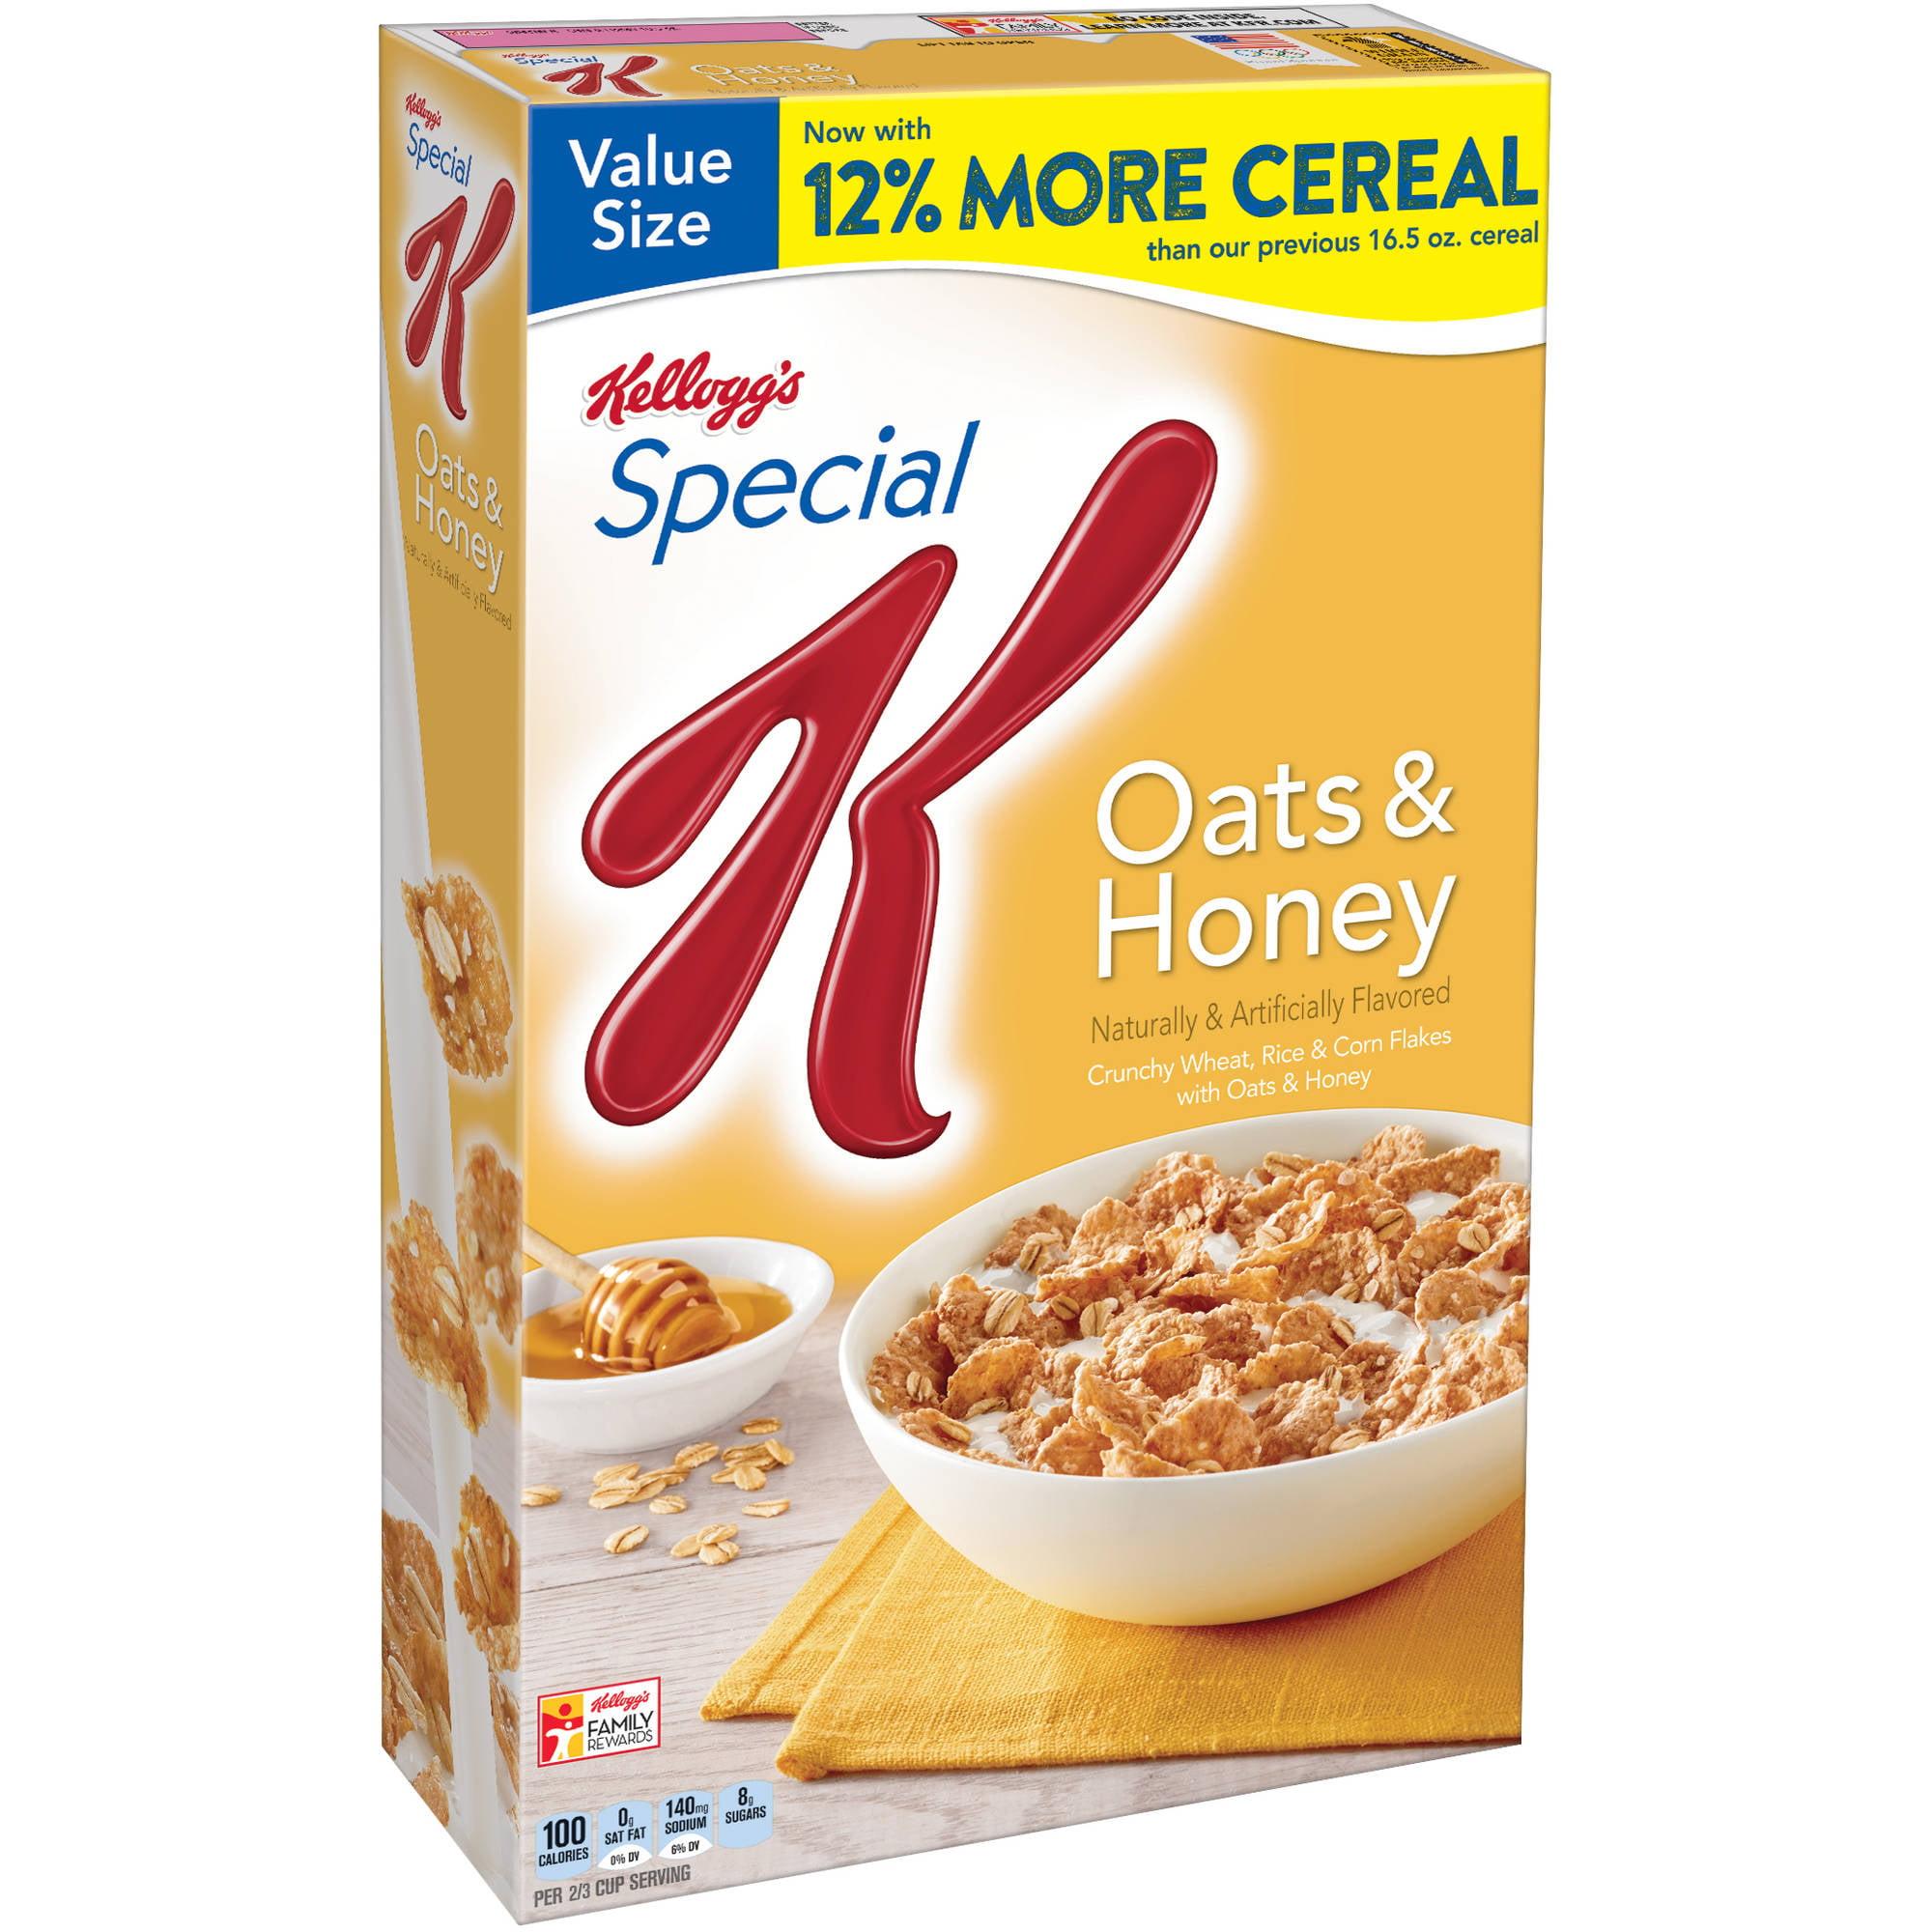 Kellogg's Special K Breakfast Cereal Oats & Honey 18.5 Oz